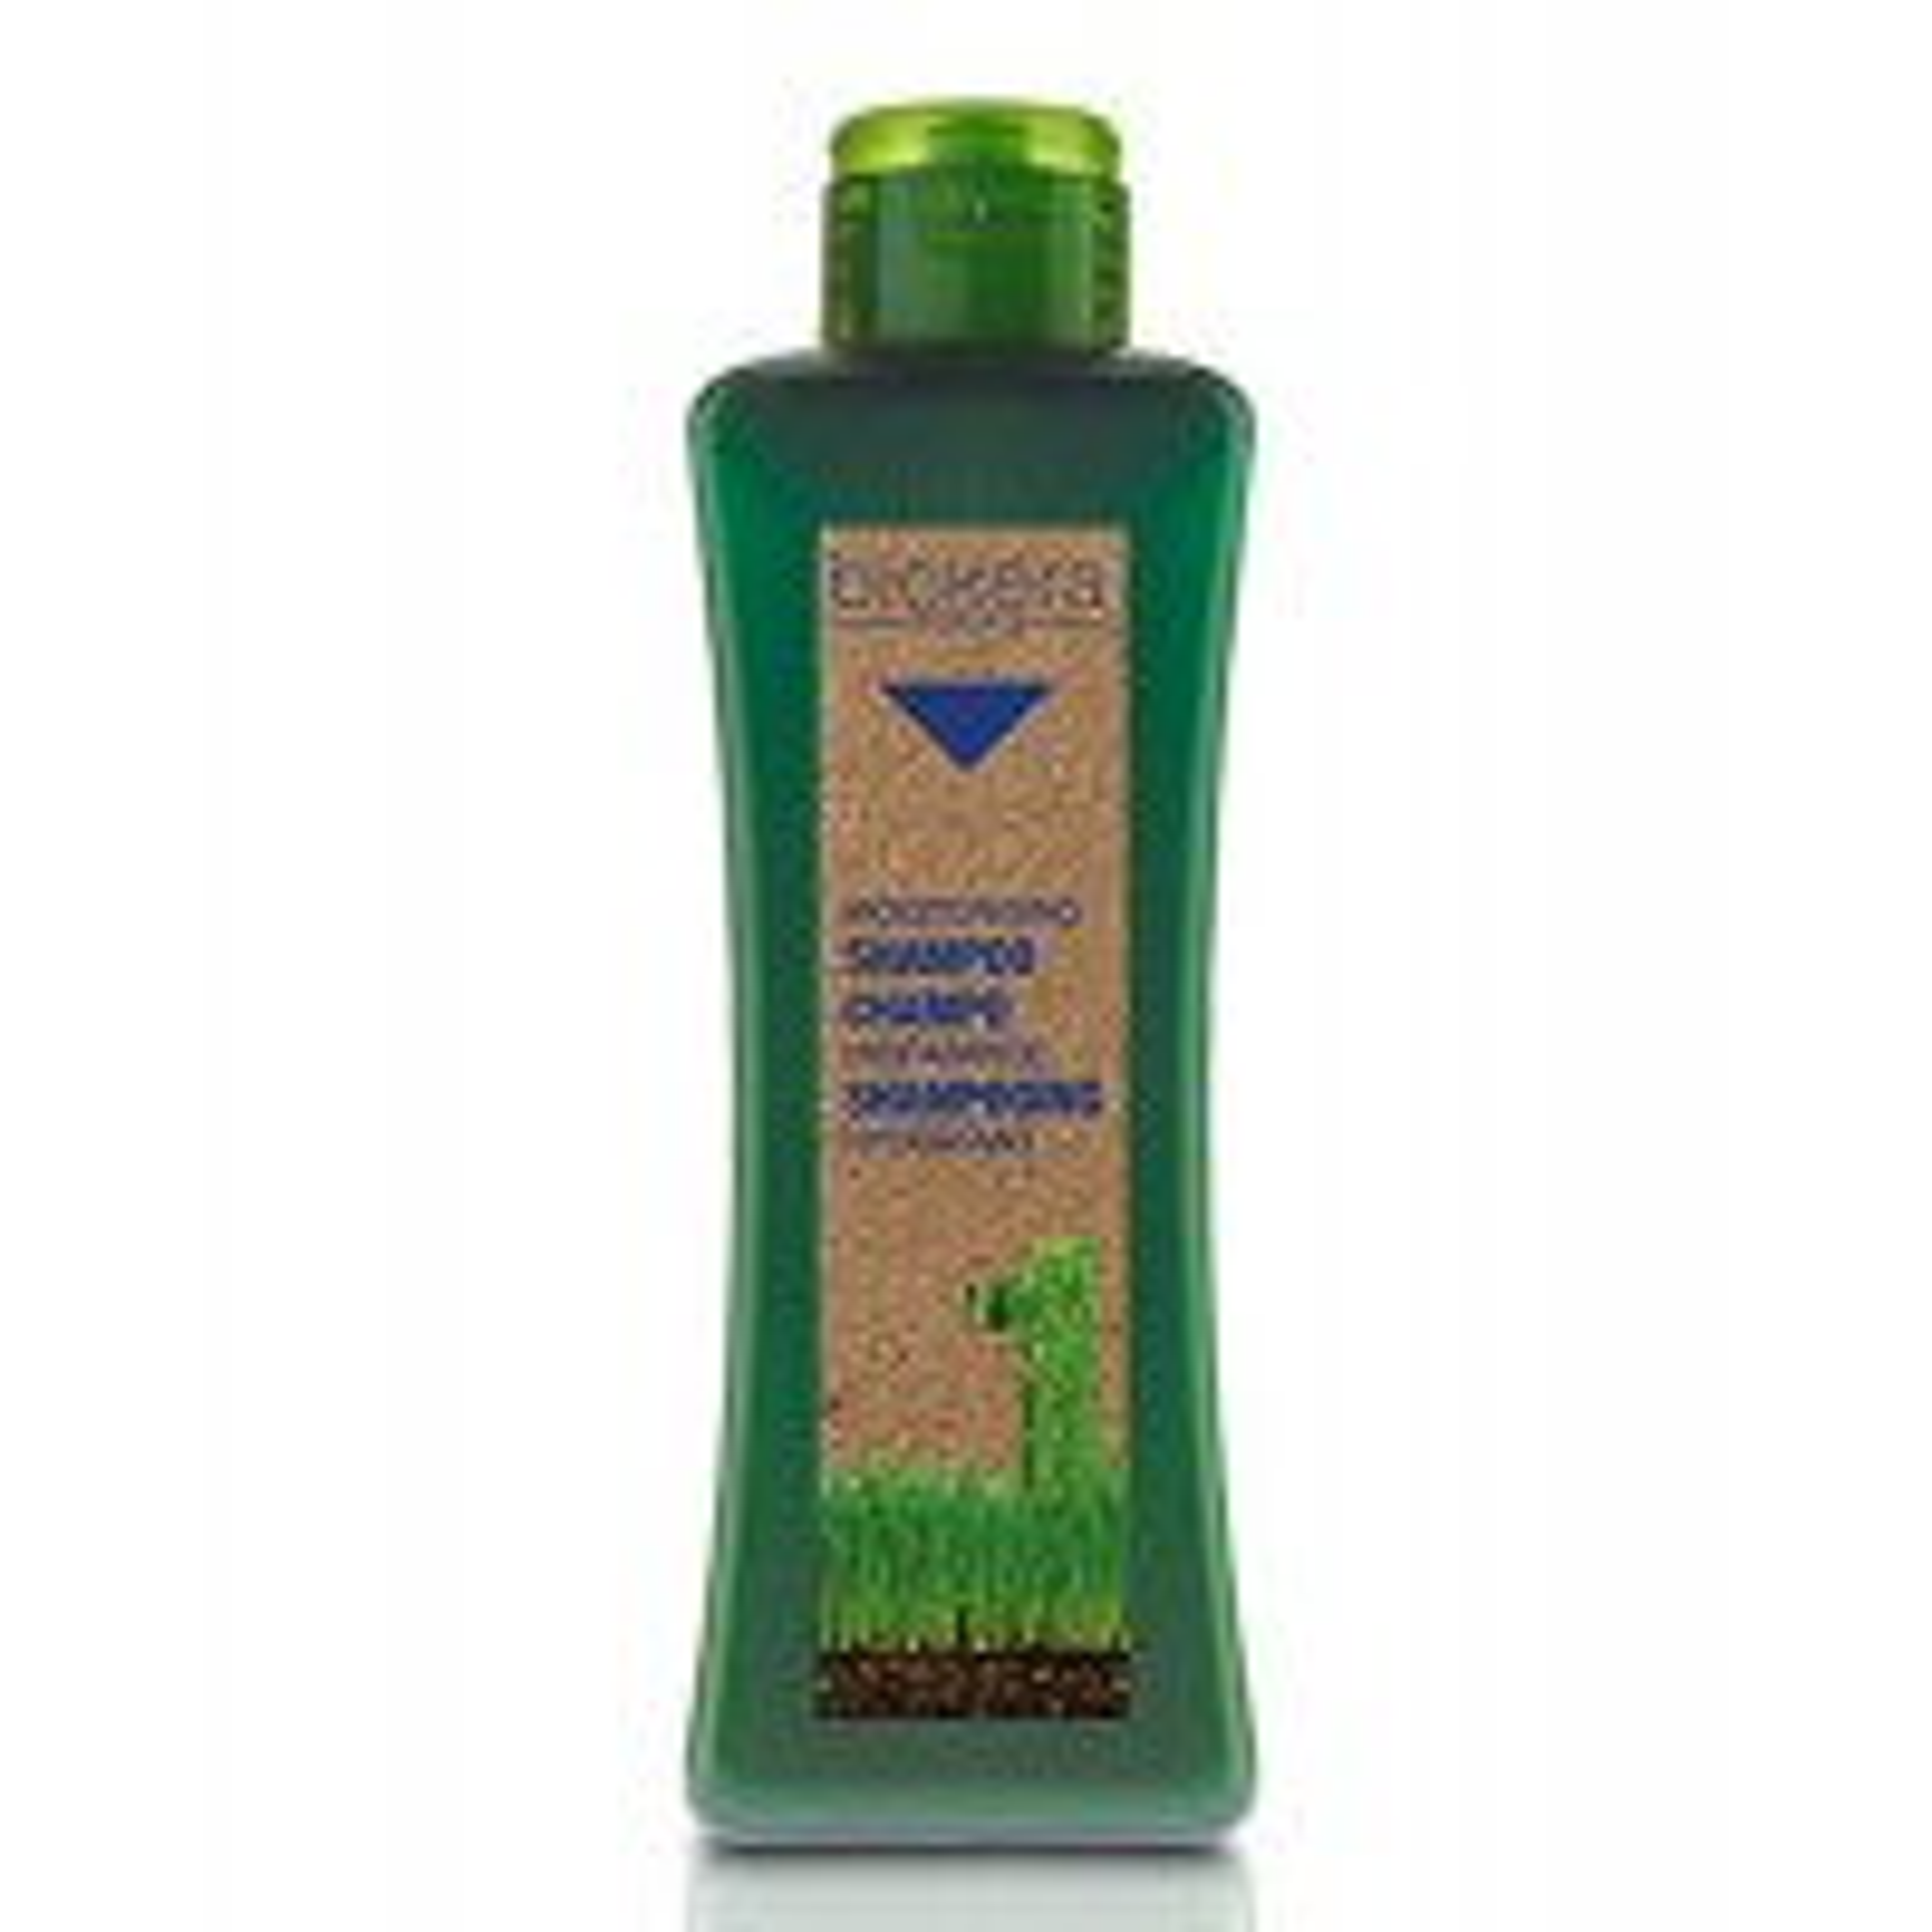 Biokera Shampoo Idratante